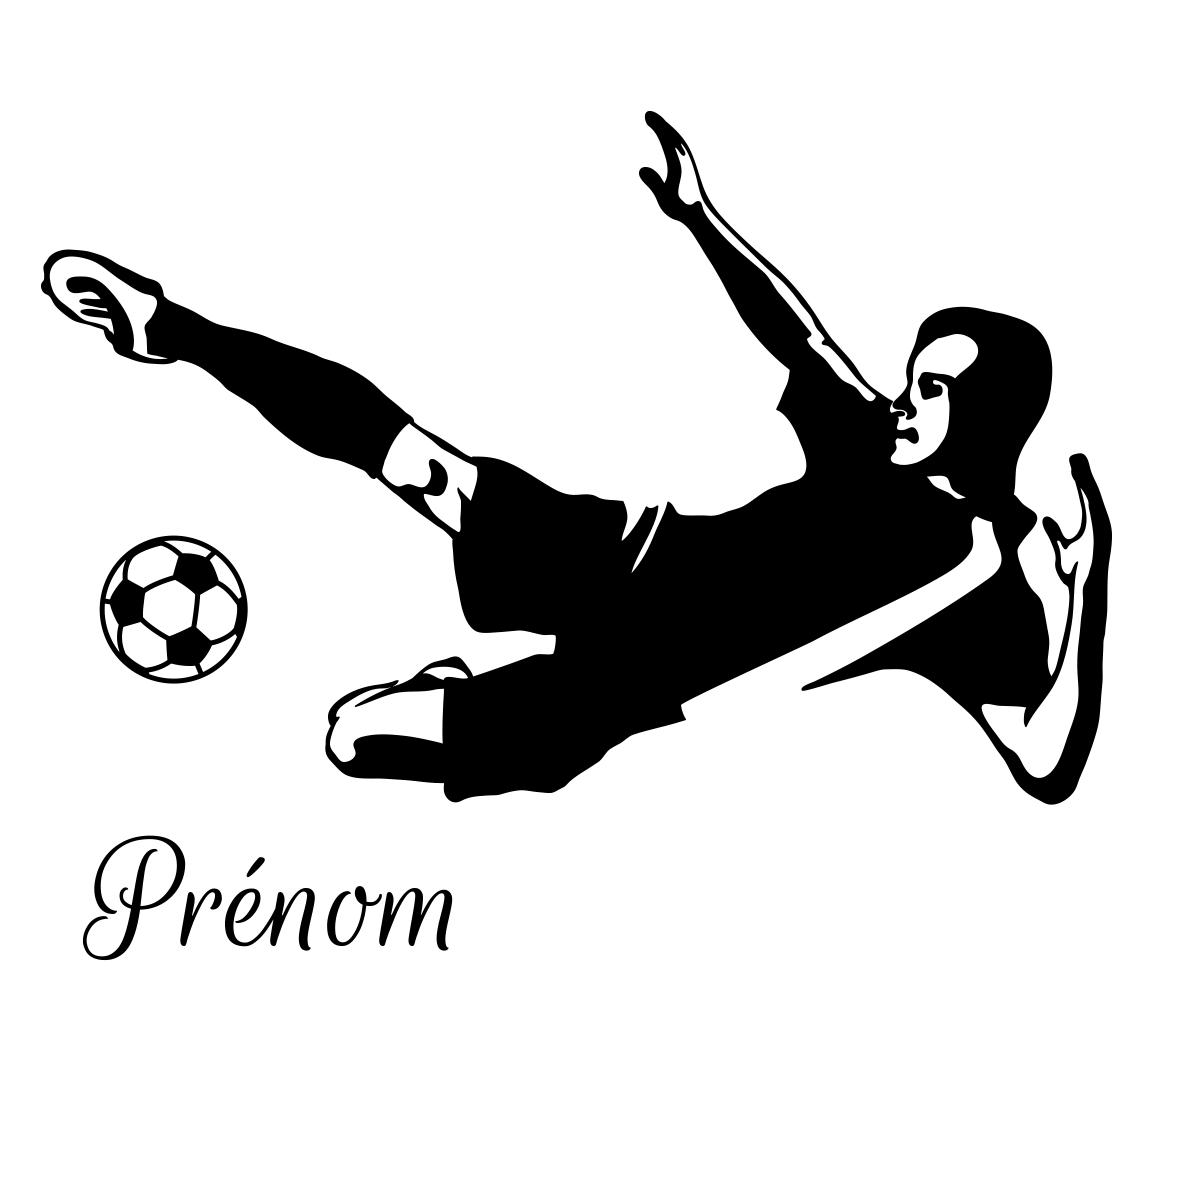 Sticker pr nom personnalis footballeur professionnel - Stickers muraux personnalise ...